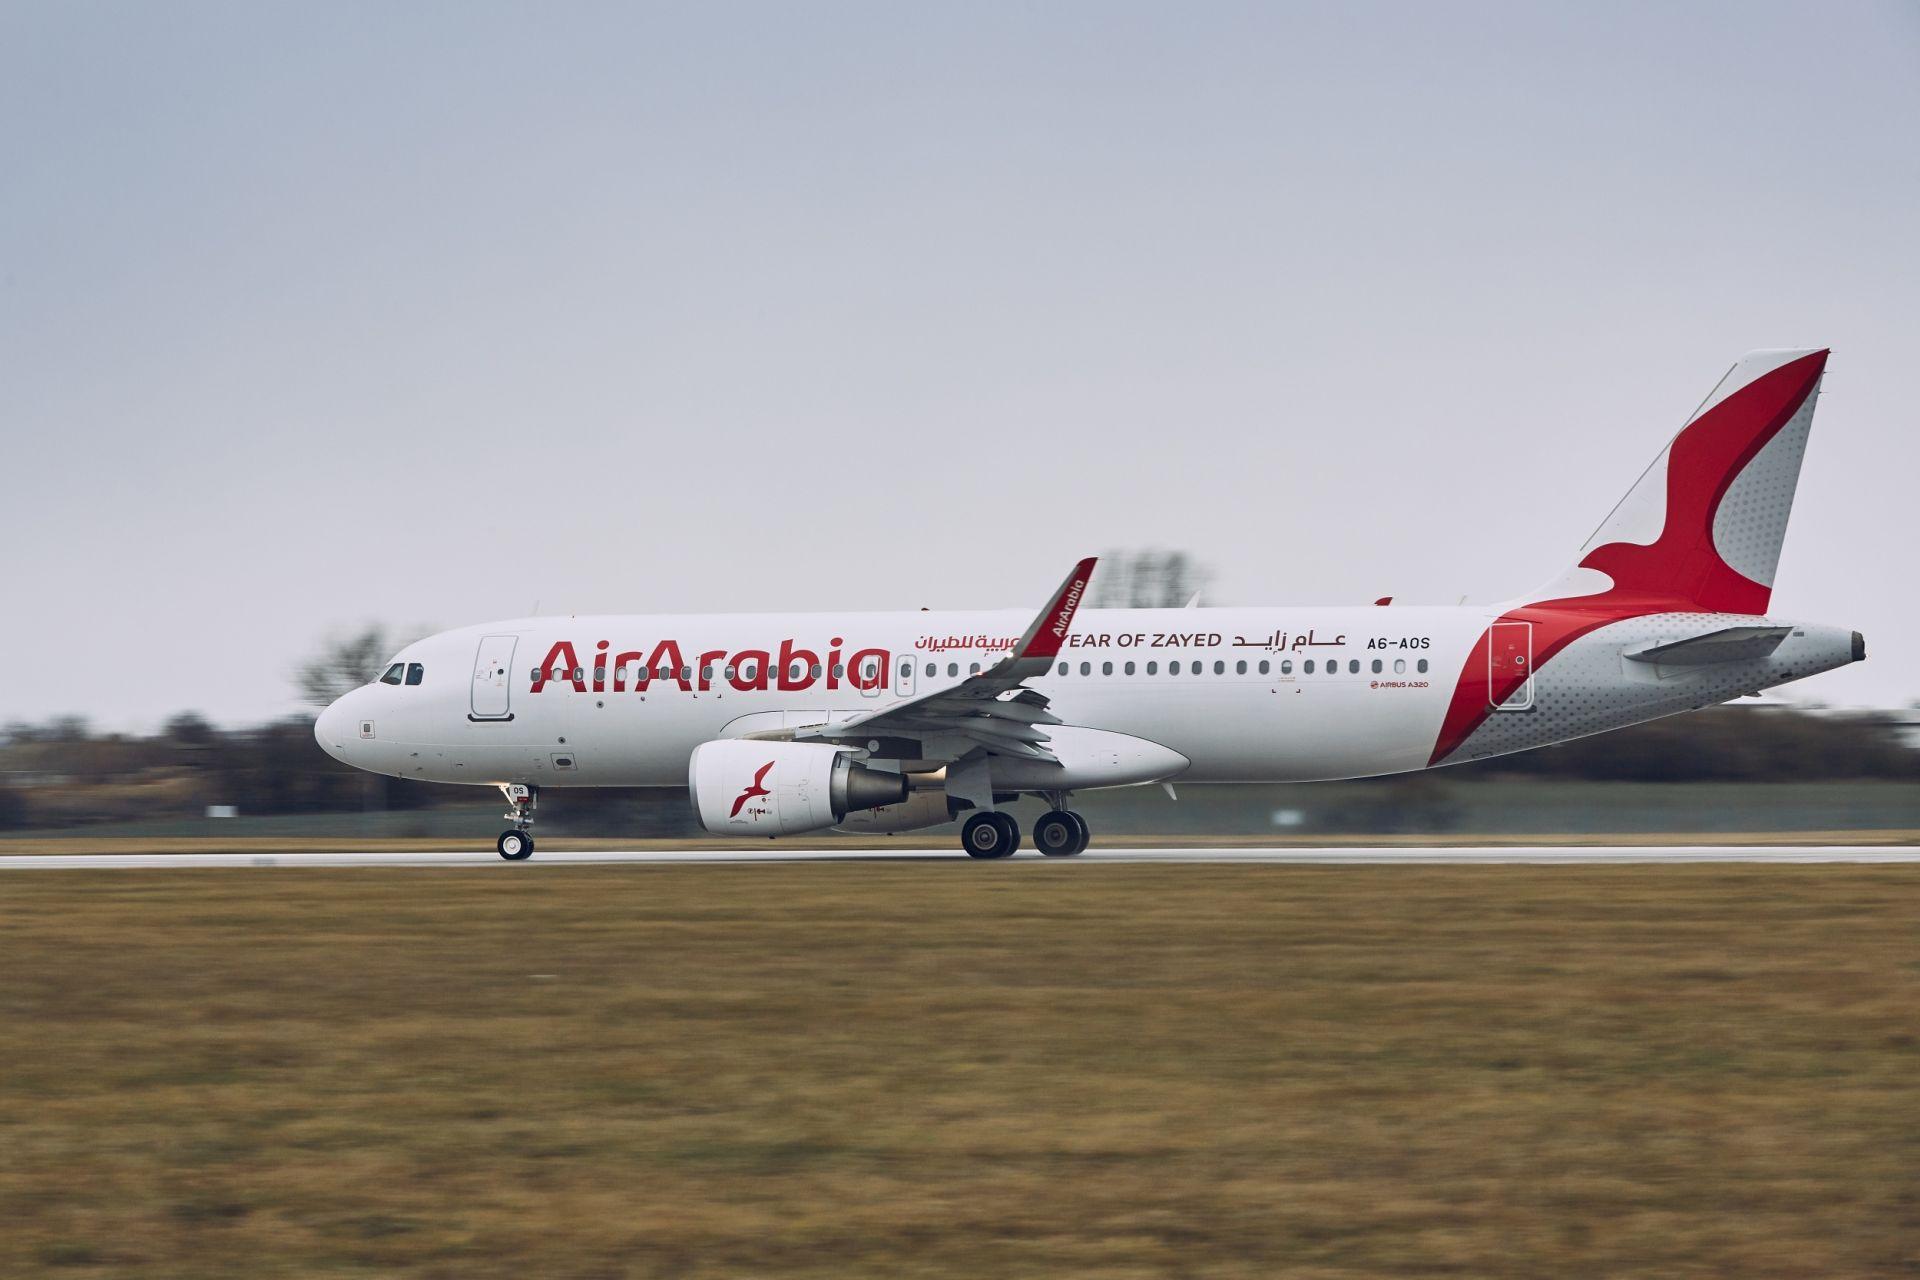 Letadlo Air Arabia v Praze. Pramen: Letiště Praha